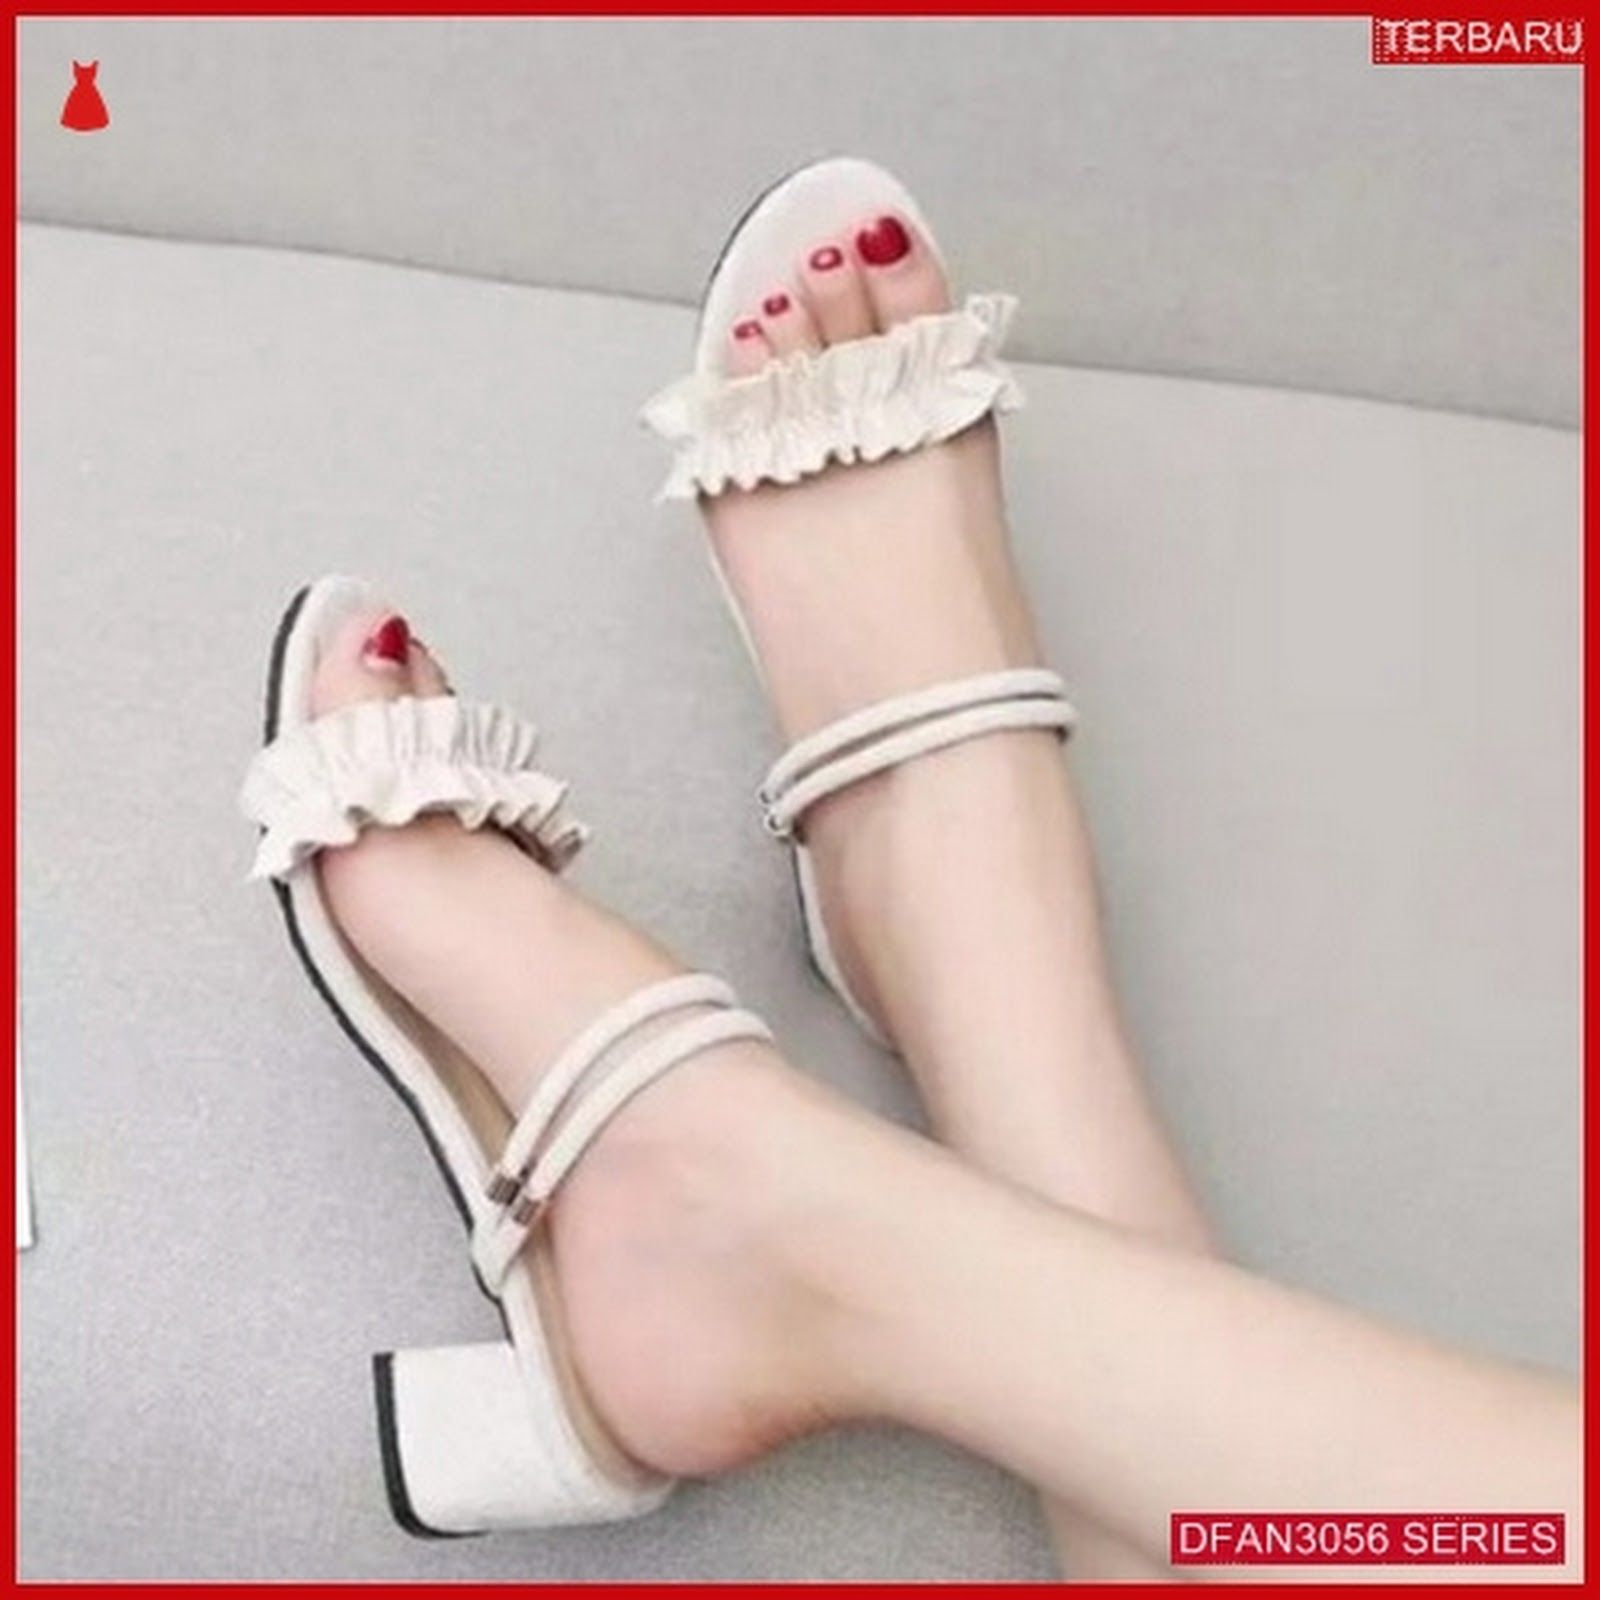 Dfan3056s28 Sepatu Sd01 Hak Tahu Wanita Sepatu Hak Fashion